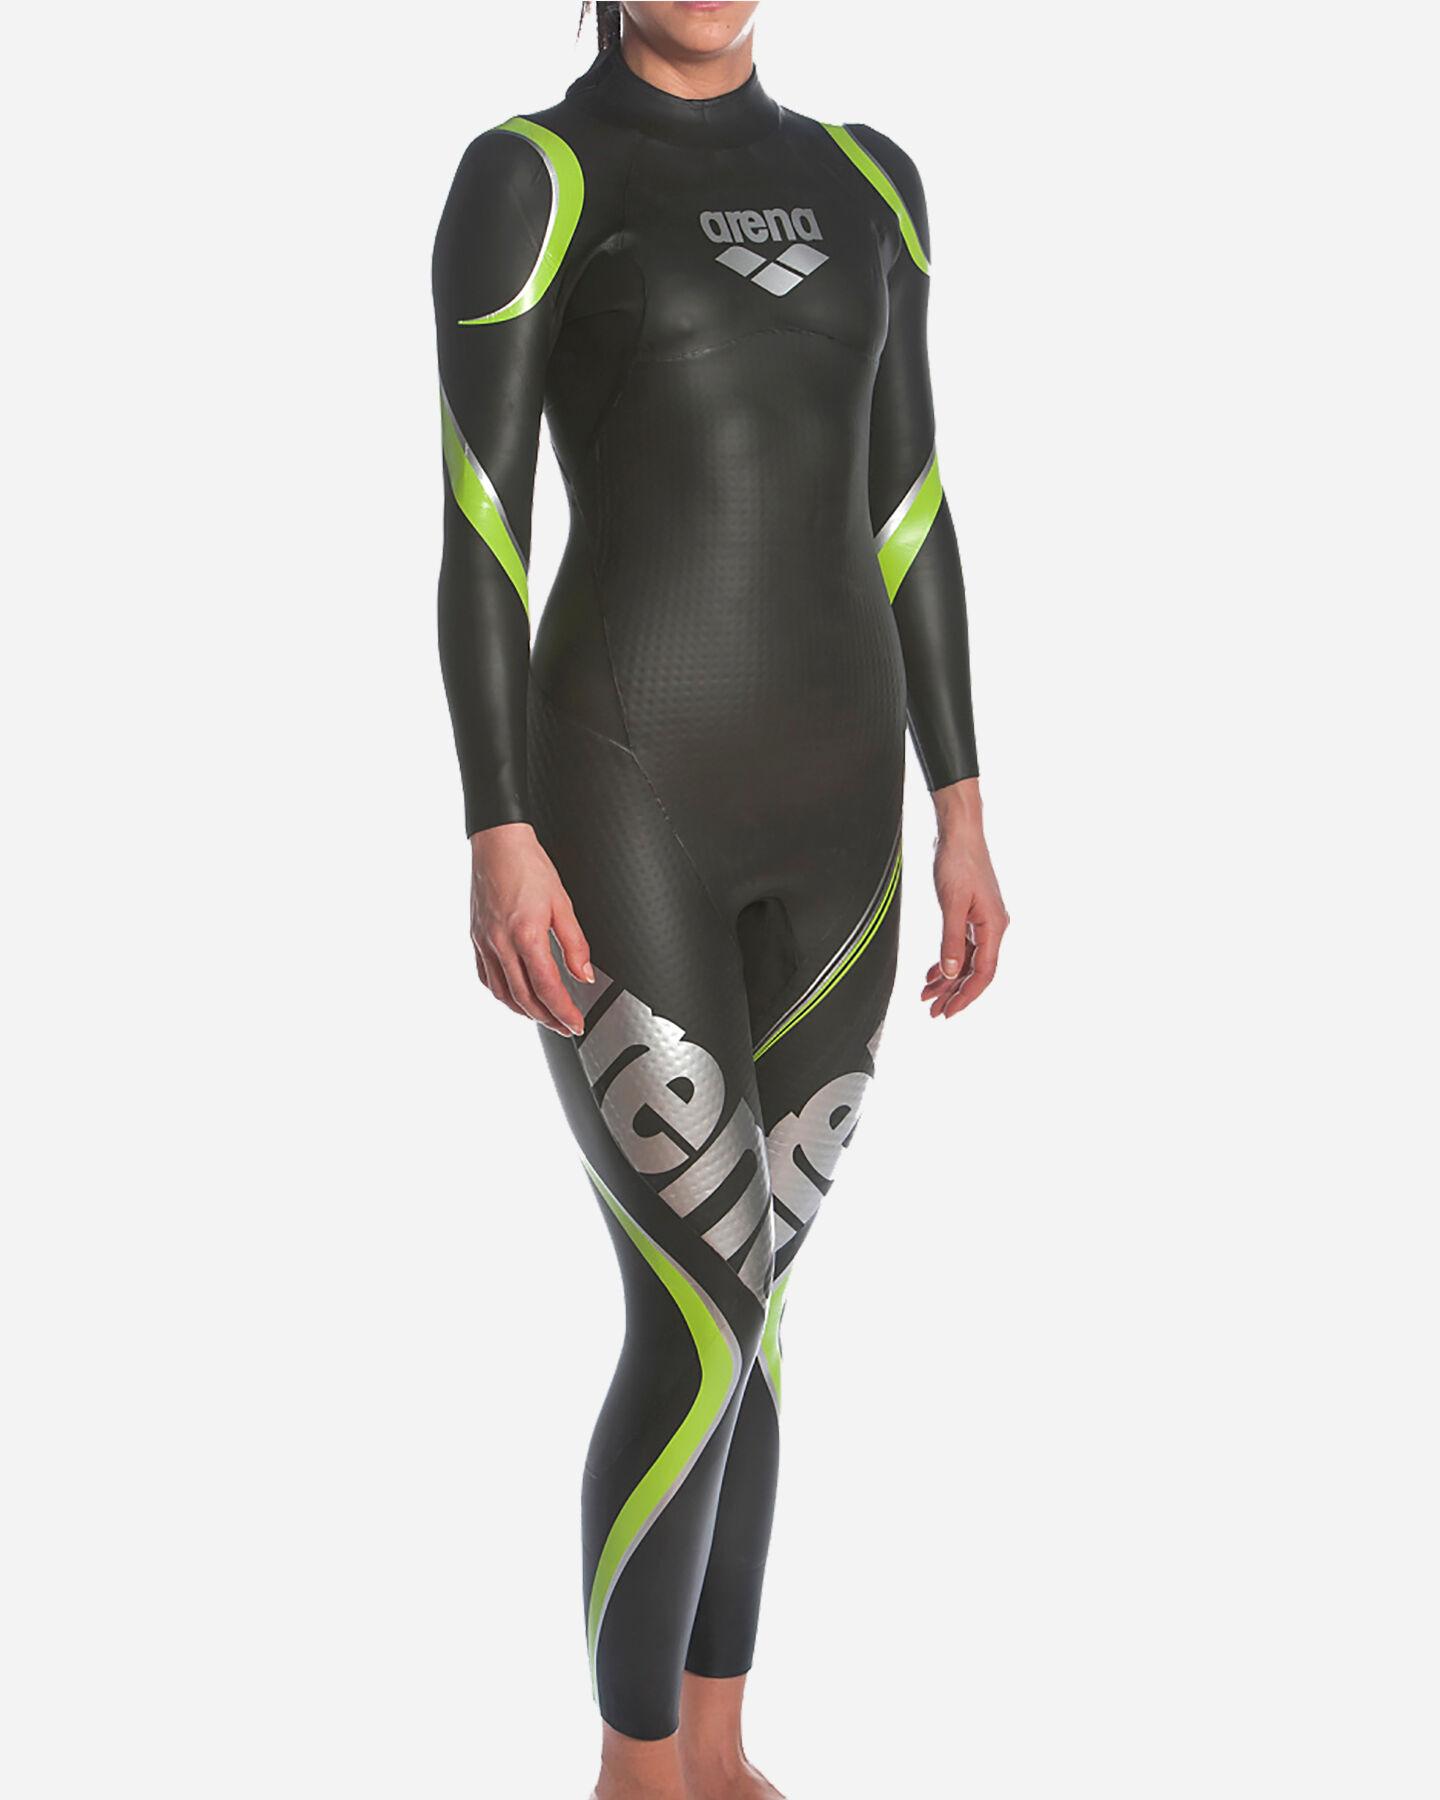 Costume piscina ARENA TRIWETSUIT CARBON W S5042136 scatto 3